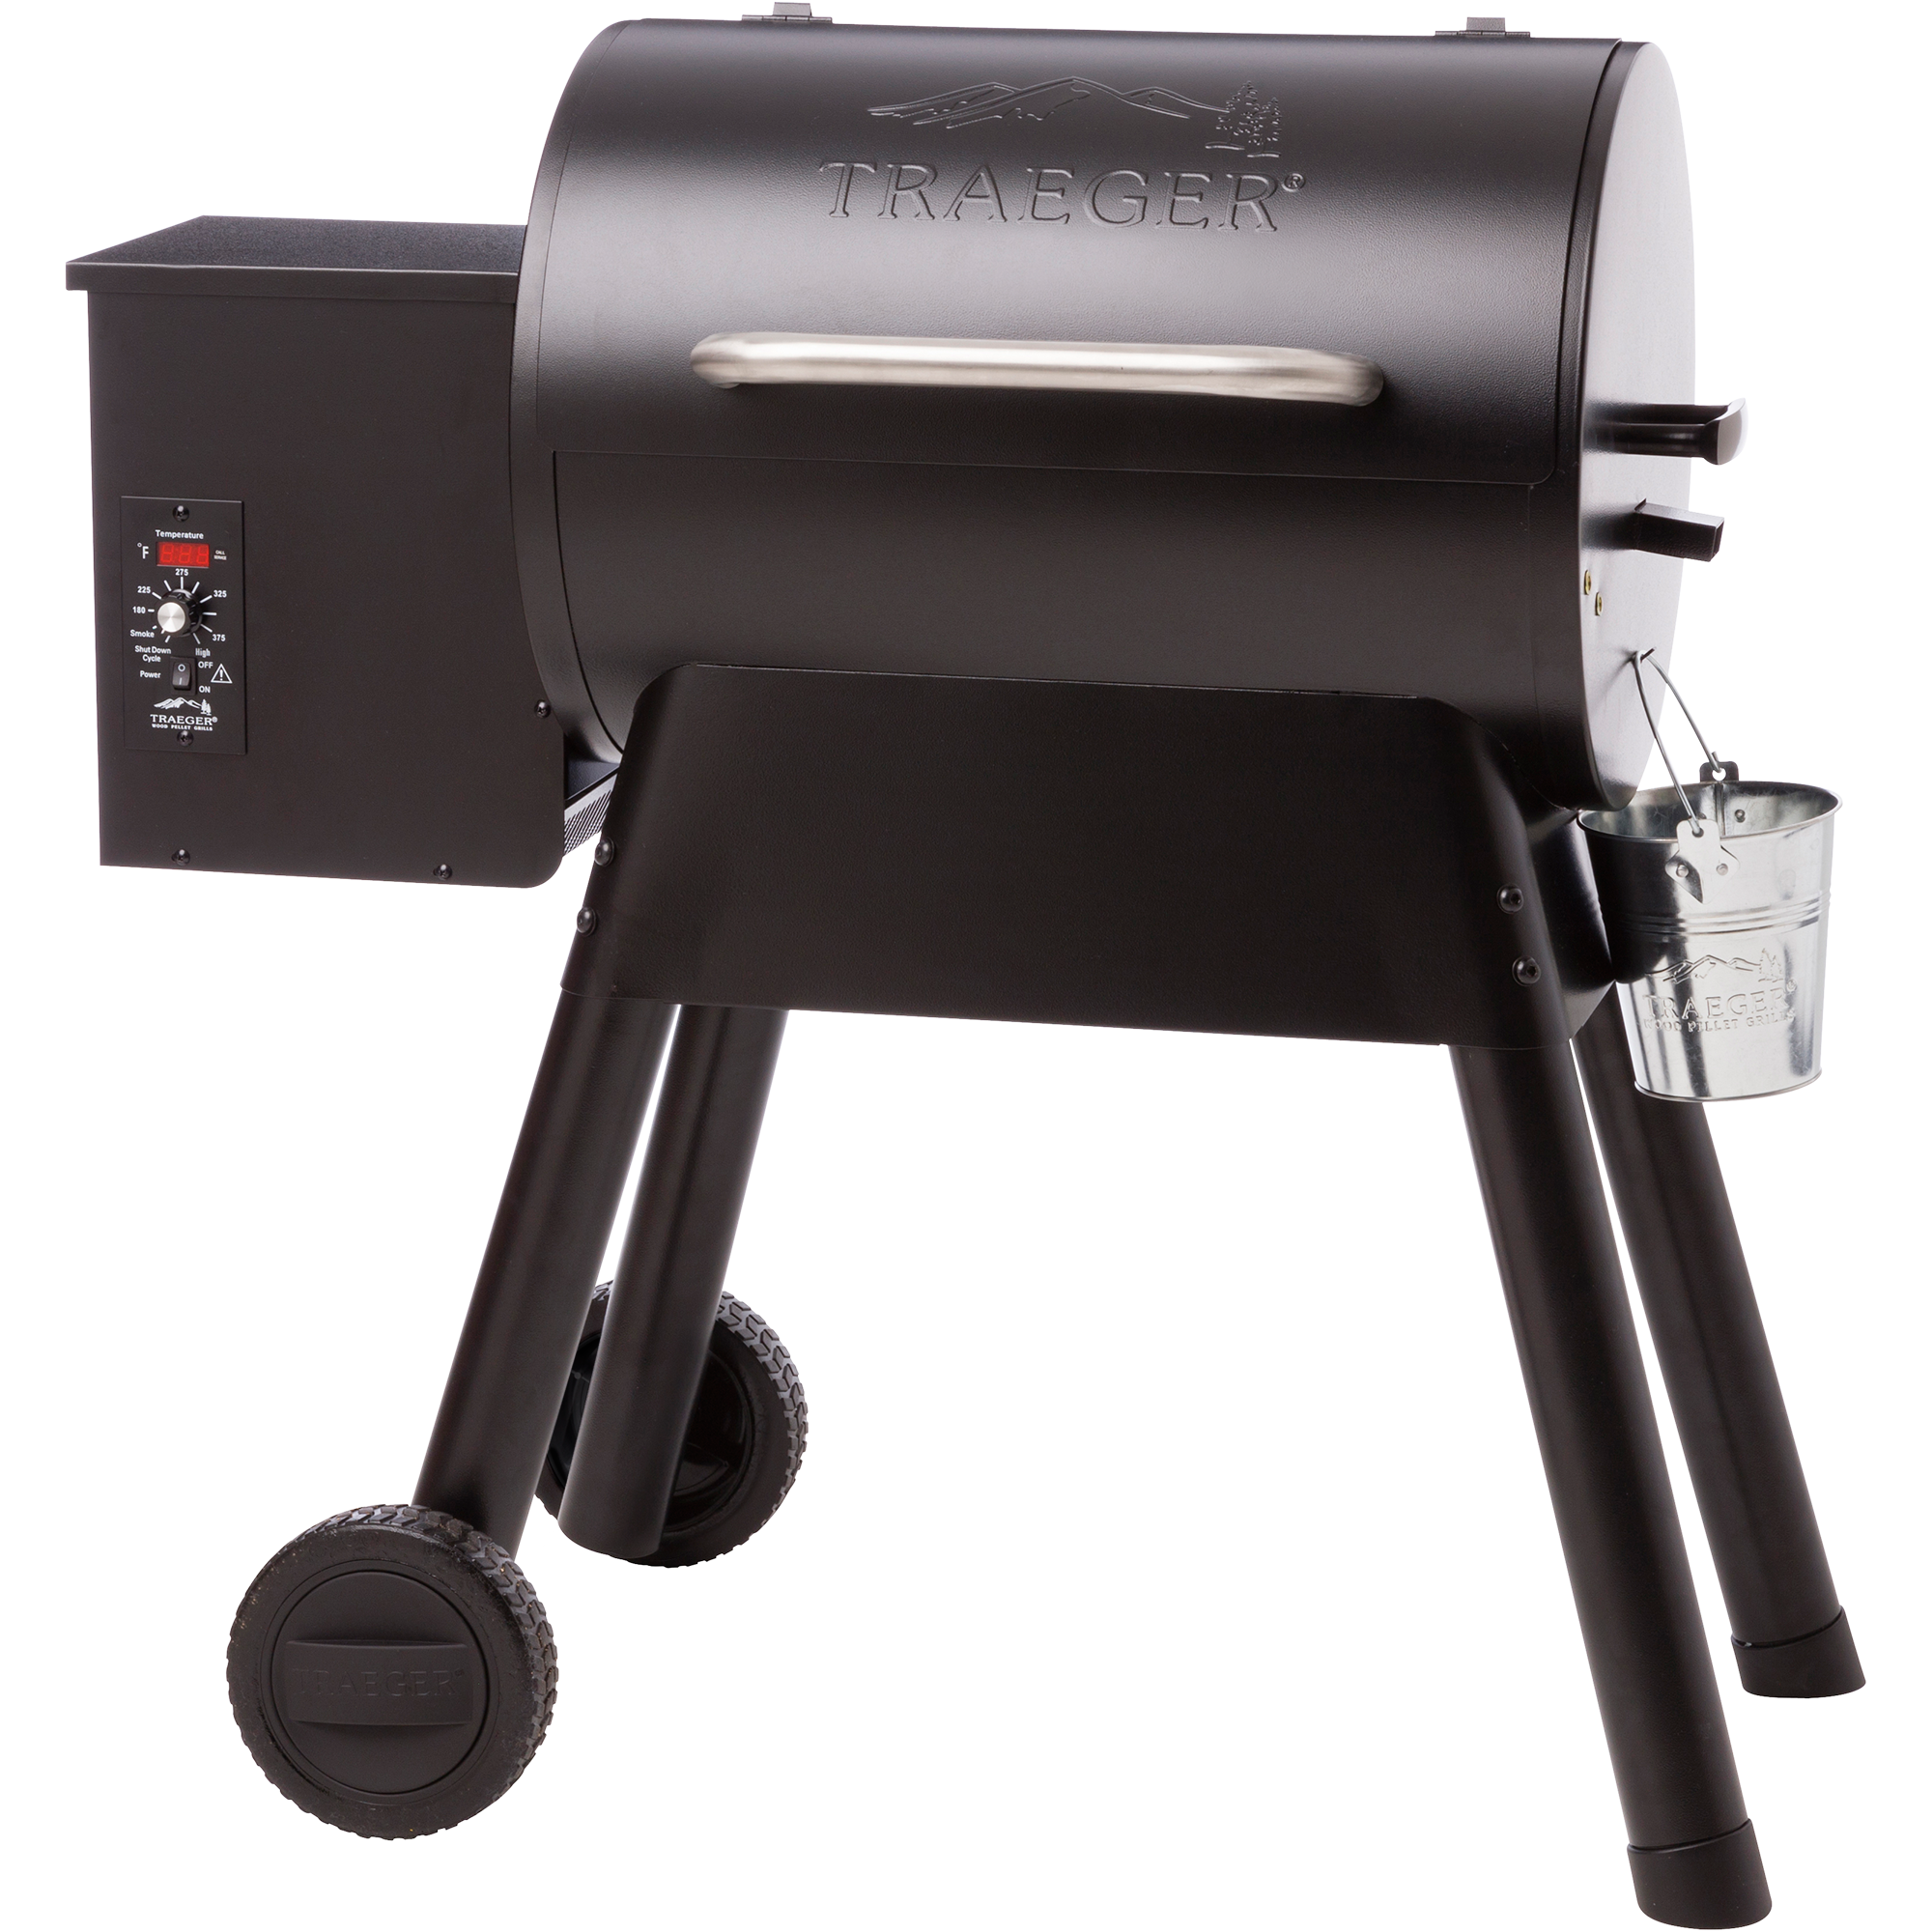 Grillplatte Fr Induktion Warranty Grill Limited Warranty With